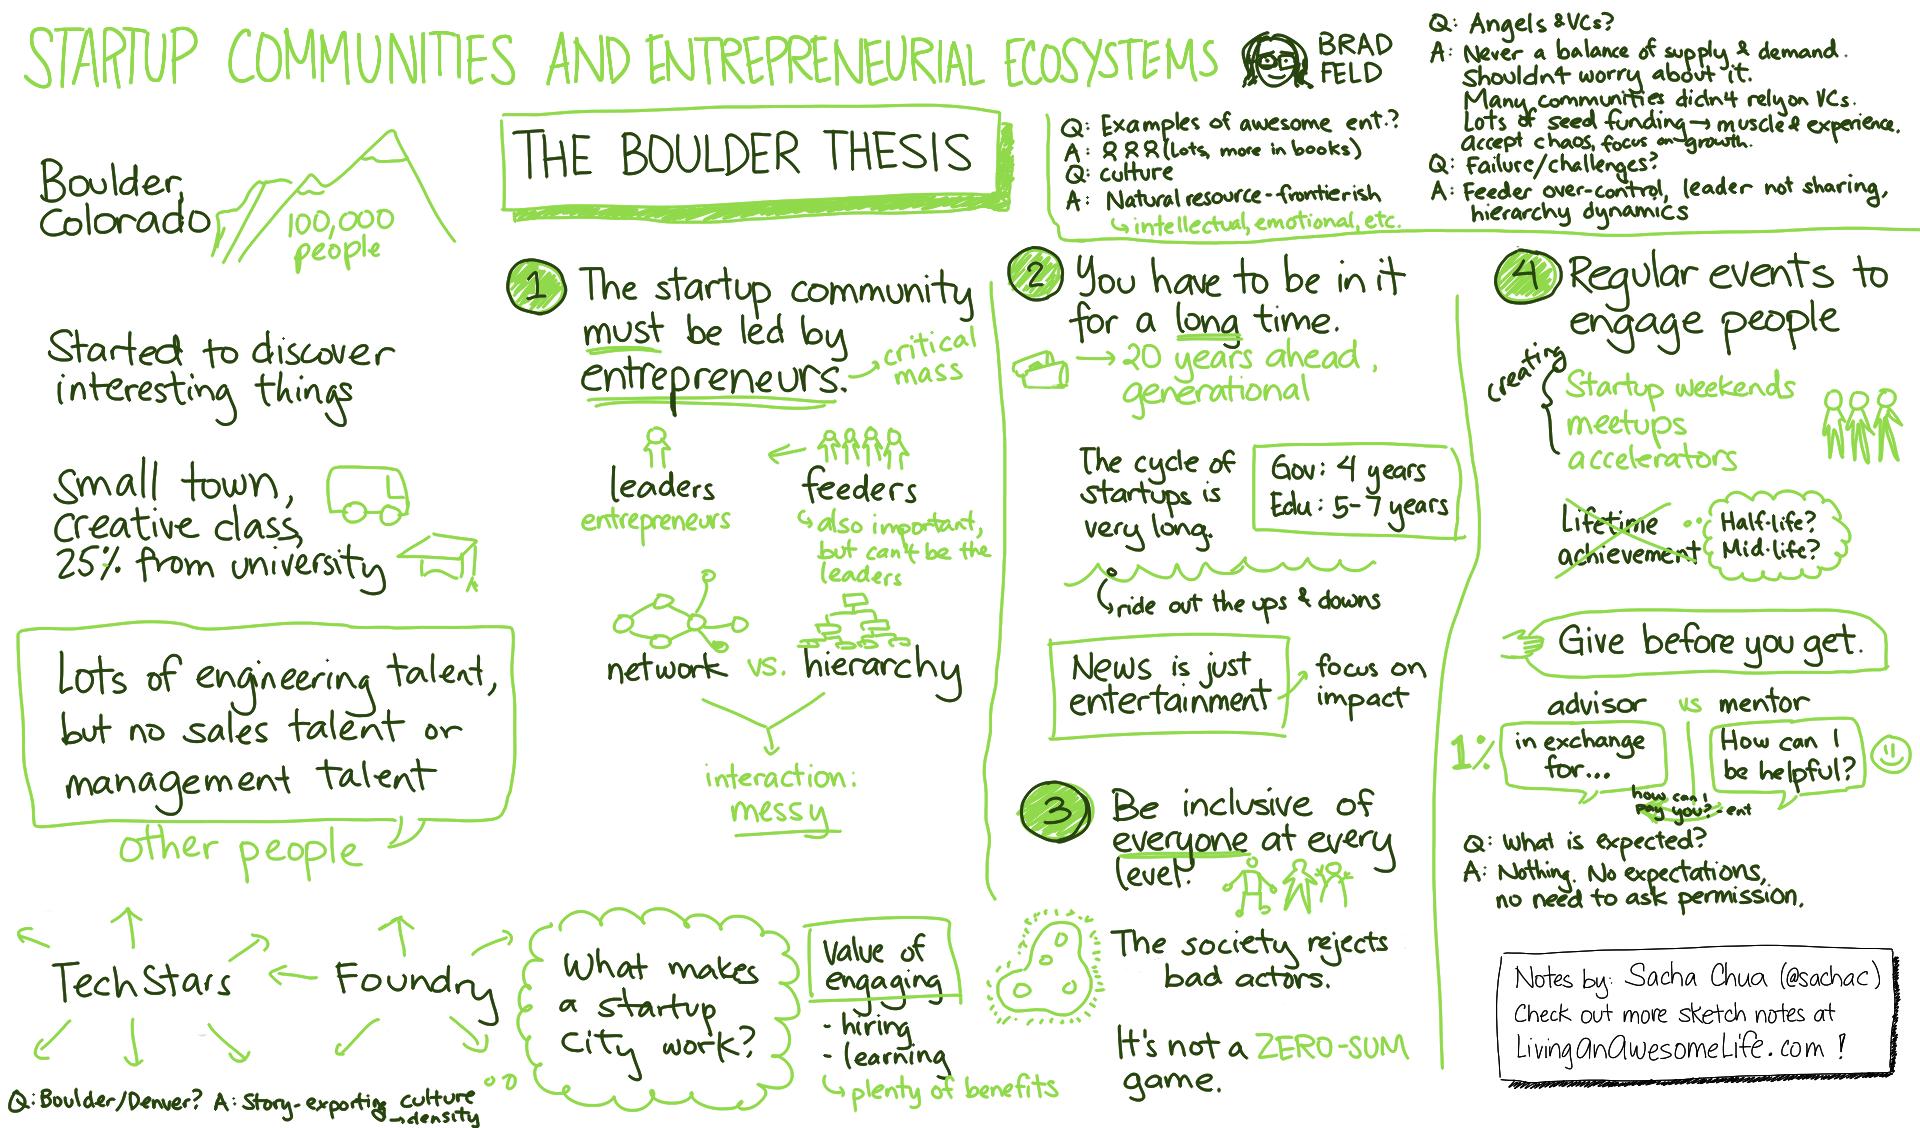 20121030-Startup-Communities-and-Entrepreneurial-Ecosystems-Brad-Feld